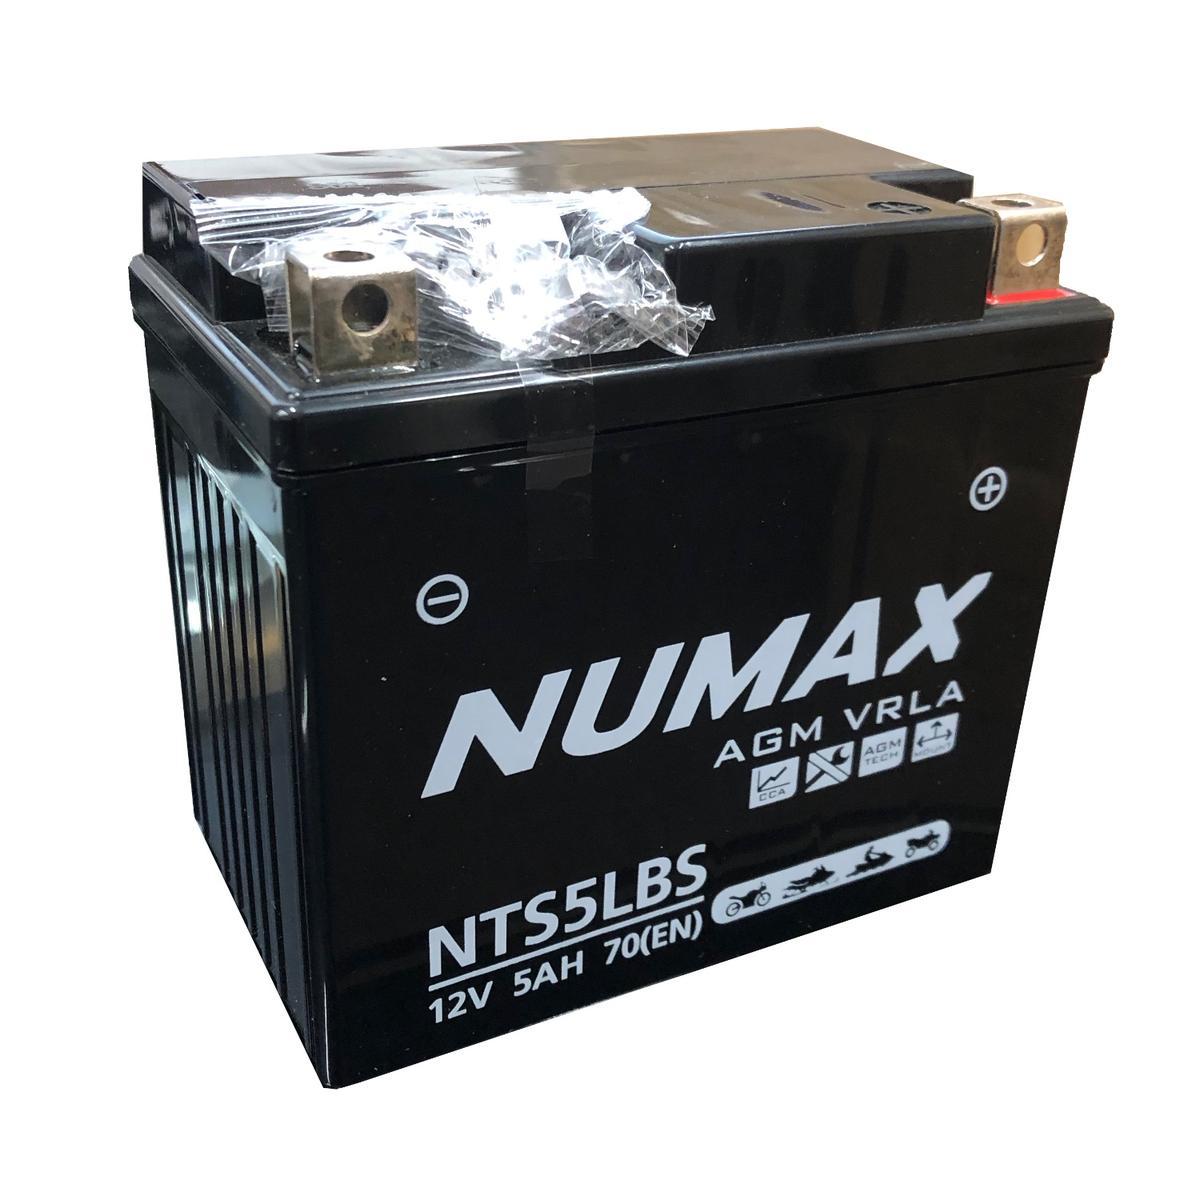 Numax NTS5LBS Motorcycle Quad Bike Scooter ATV Battery